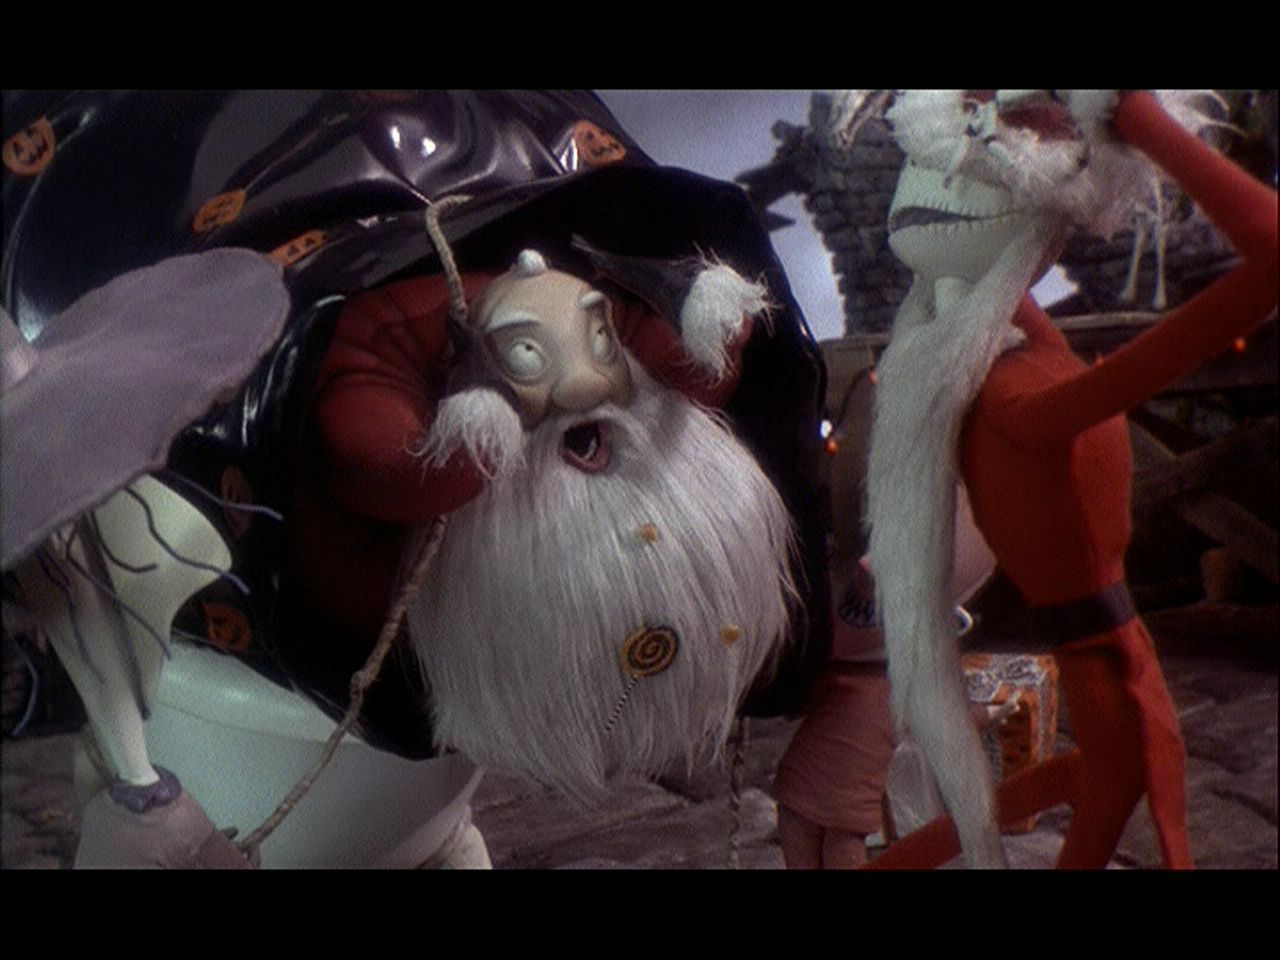 Nightmare before christmas full movie part 1 : In plain sight season ...